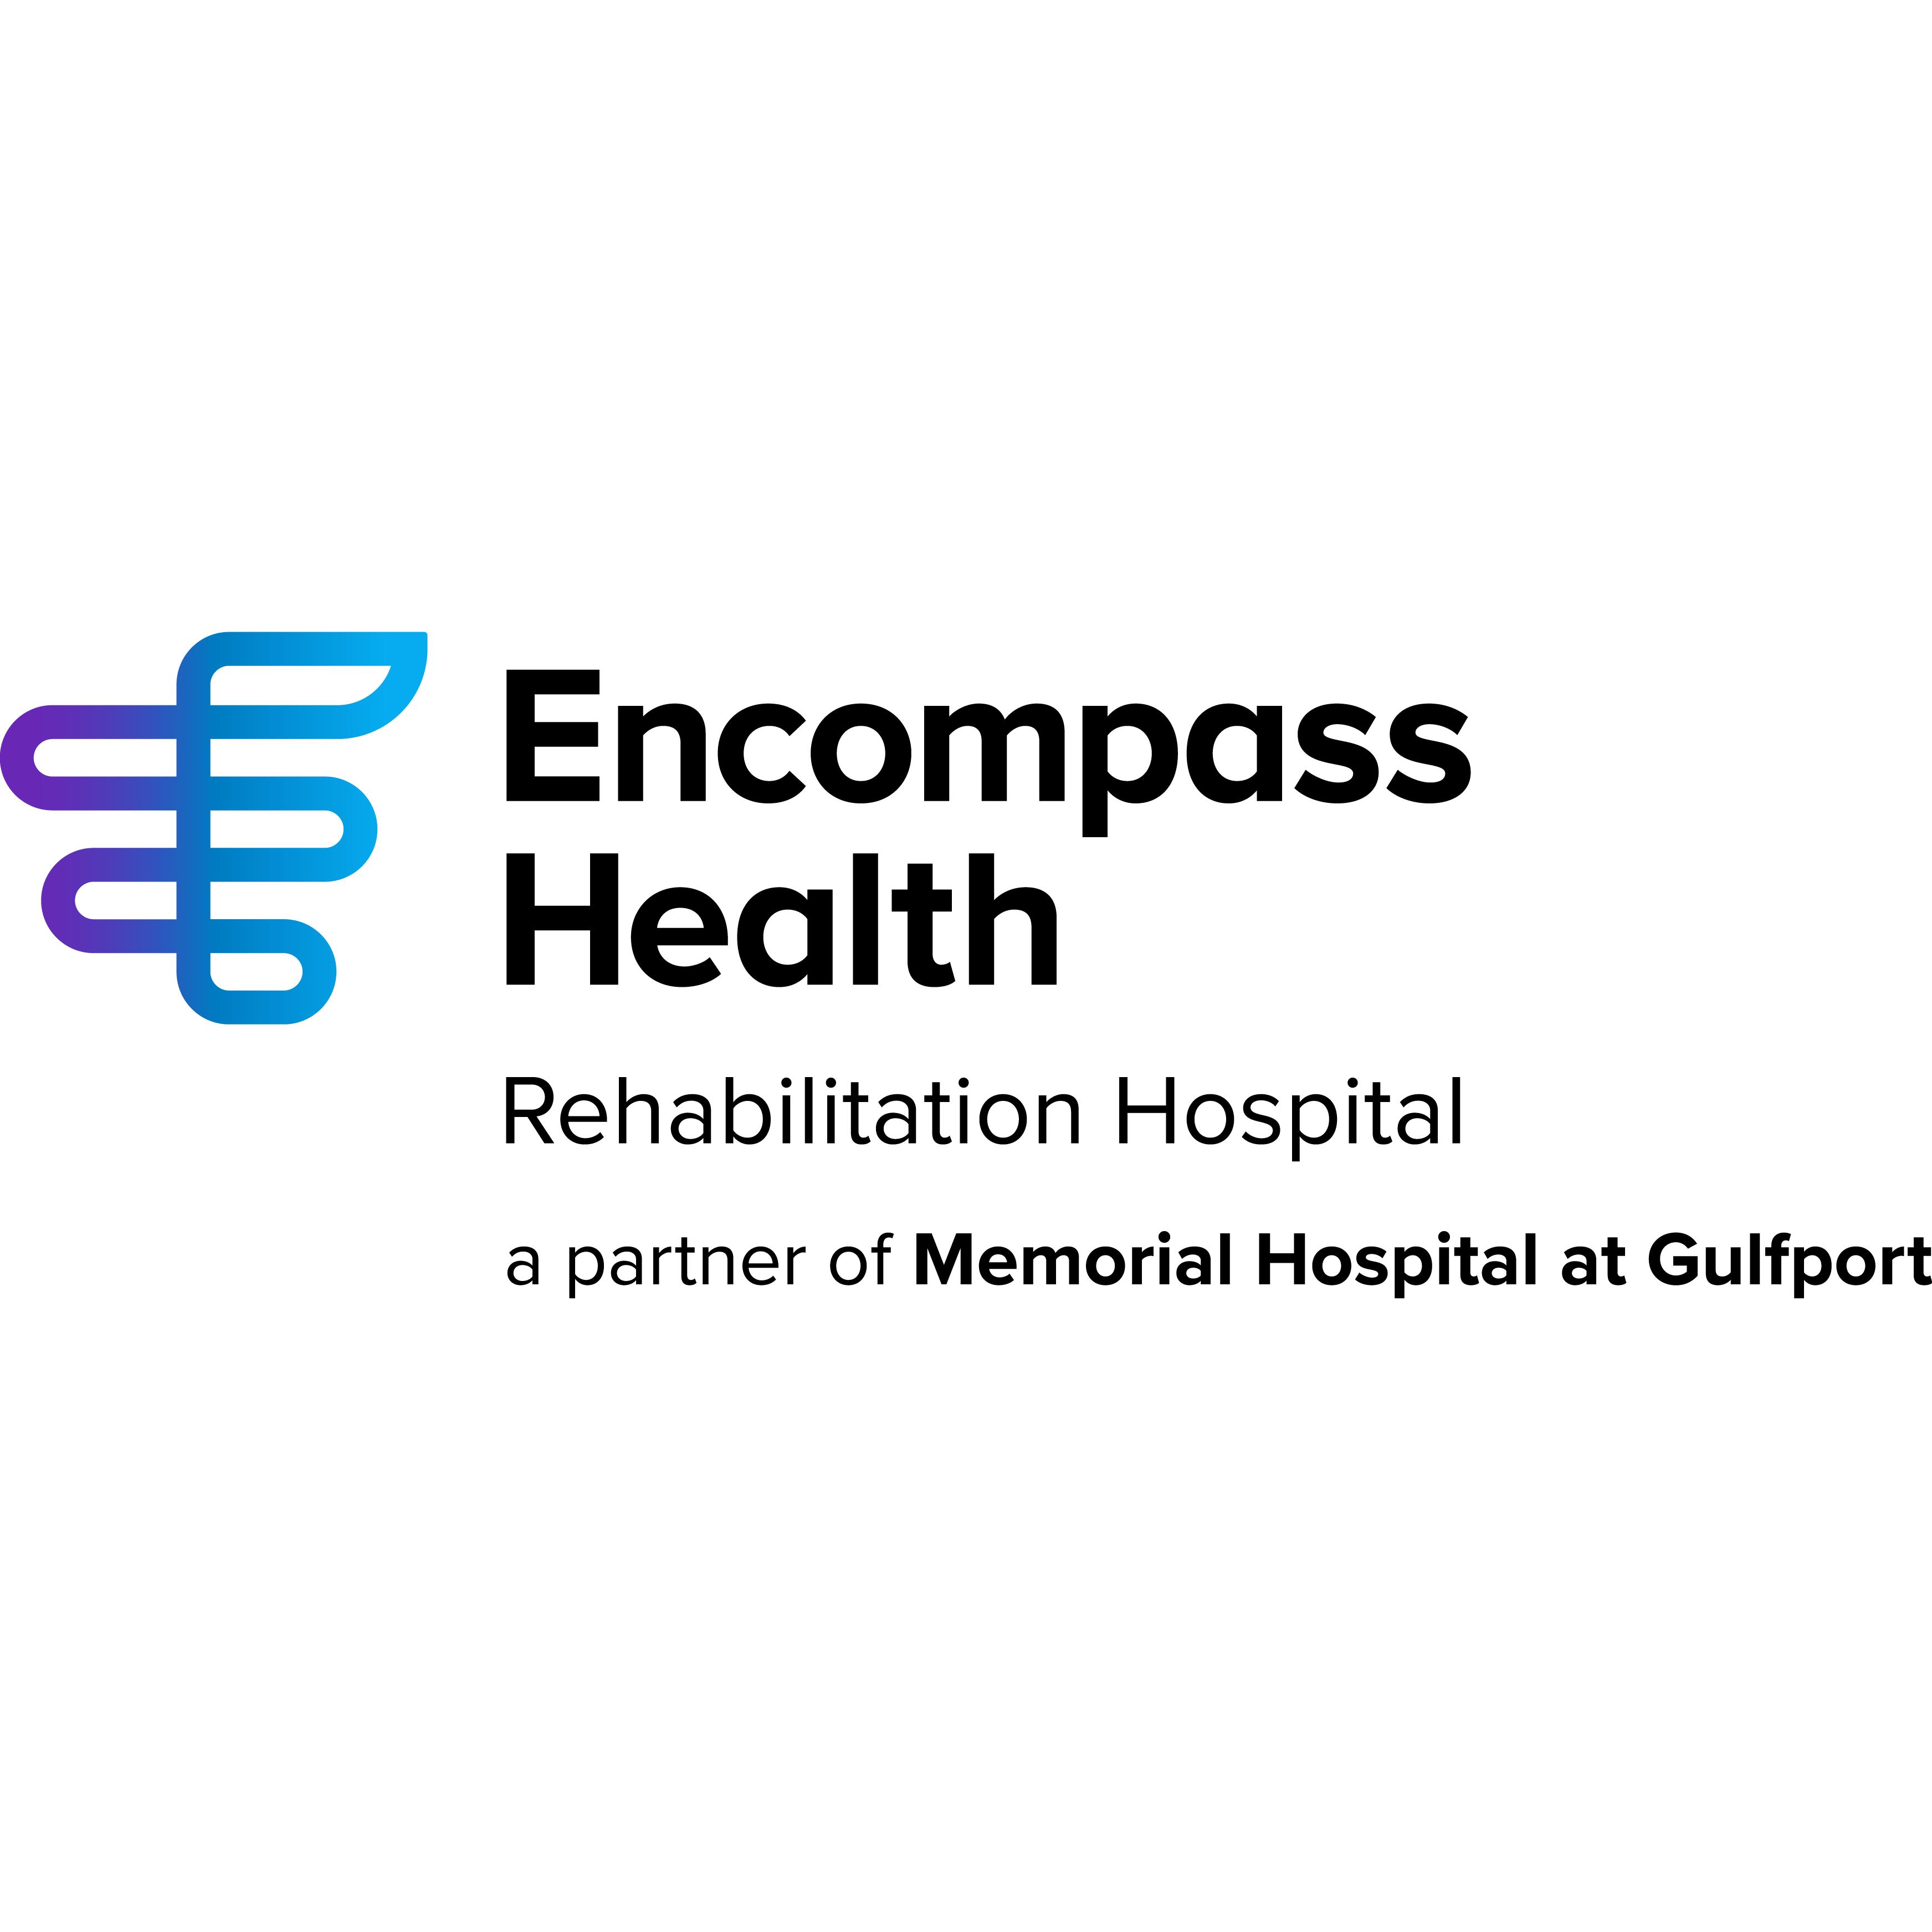 Encompass Health Rehabilitation Hospital, a partner of Memorial Hospital at Gulfport